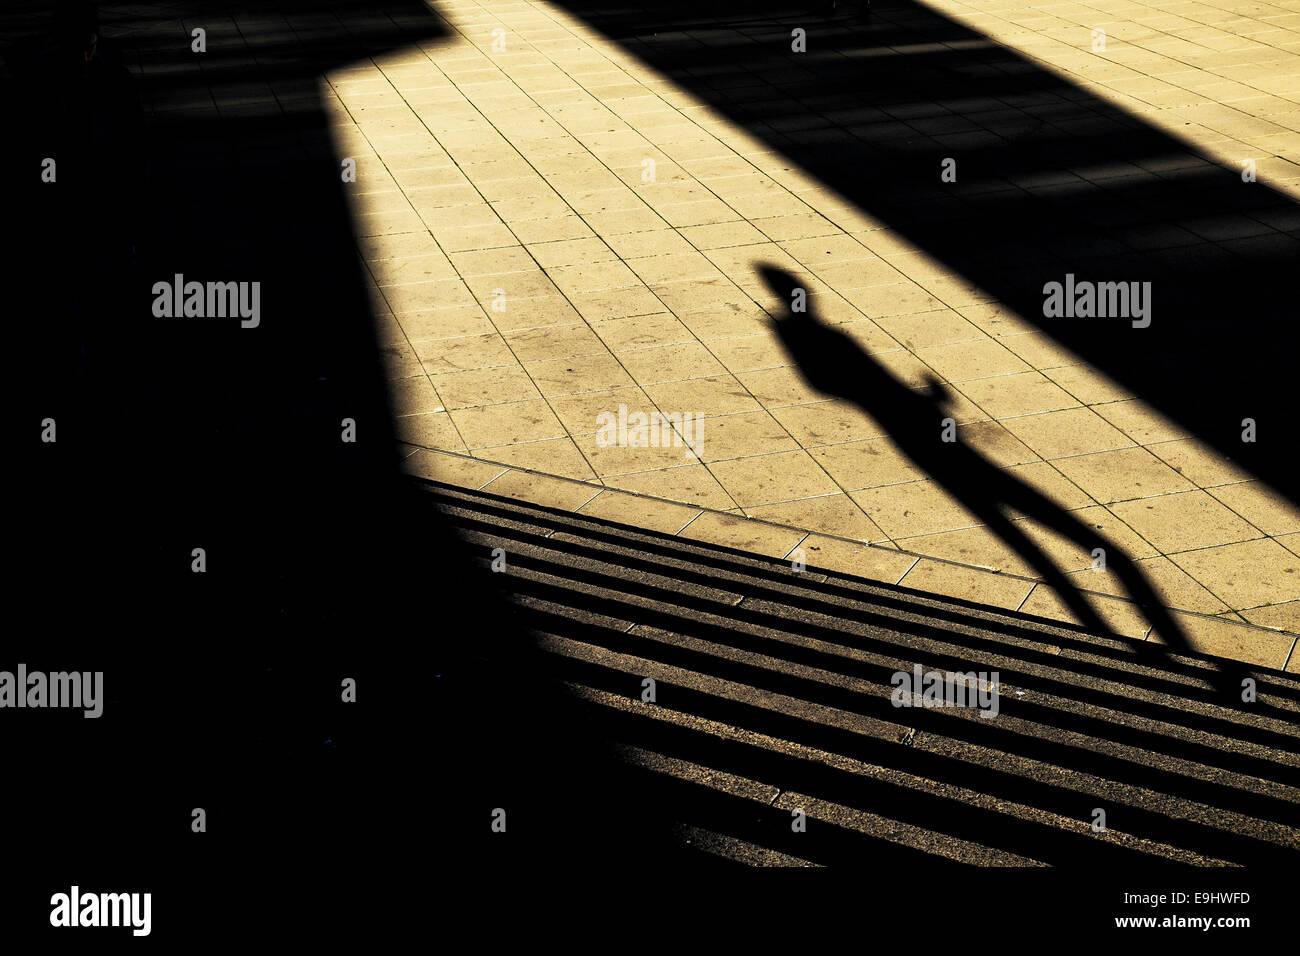 Basildon, Essex, UK. 28 October 2014.  Unseasonal warm sunshine casting shadows of shoppers in Basildon Town Centre. - Stock Image